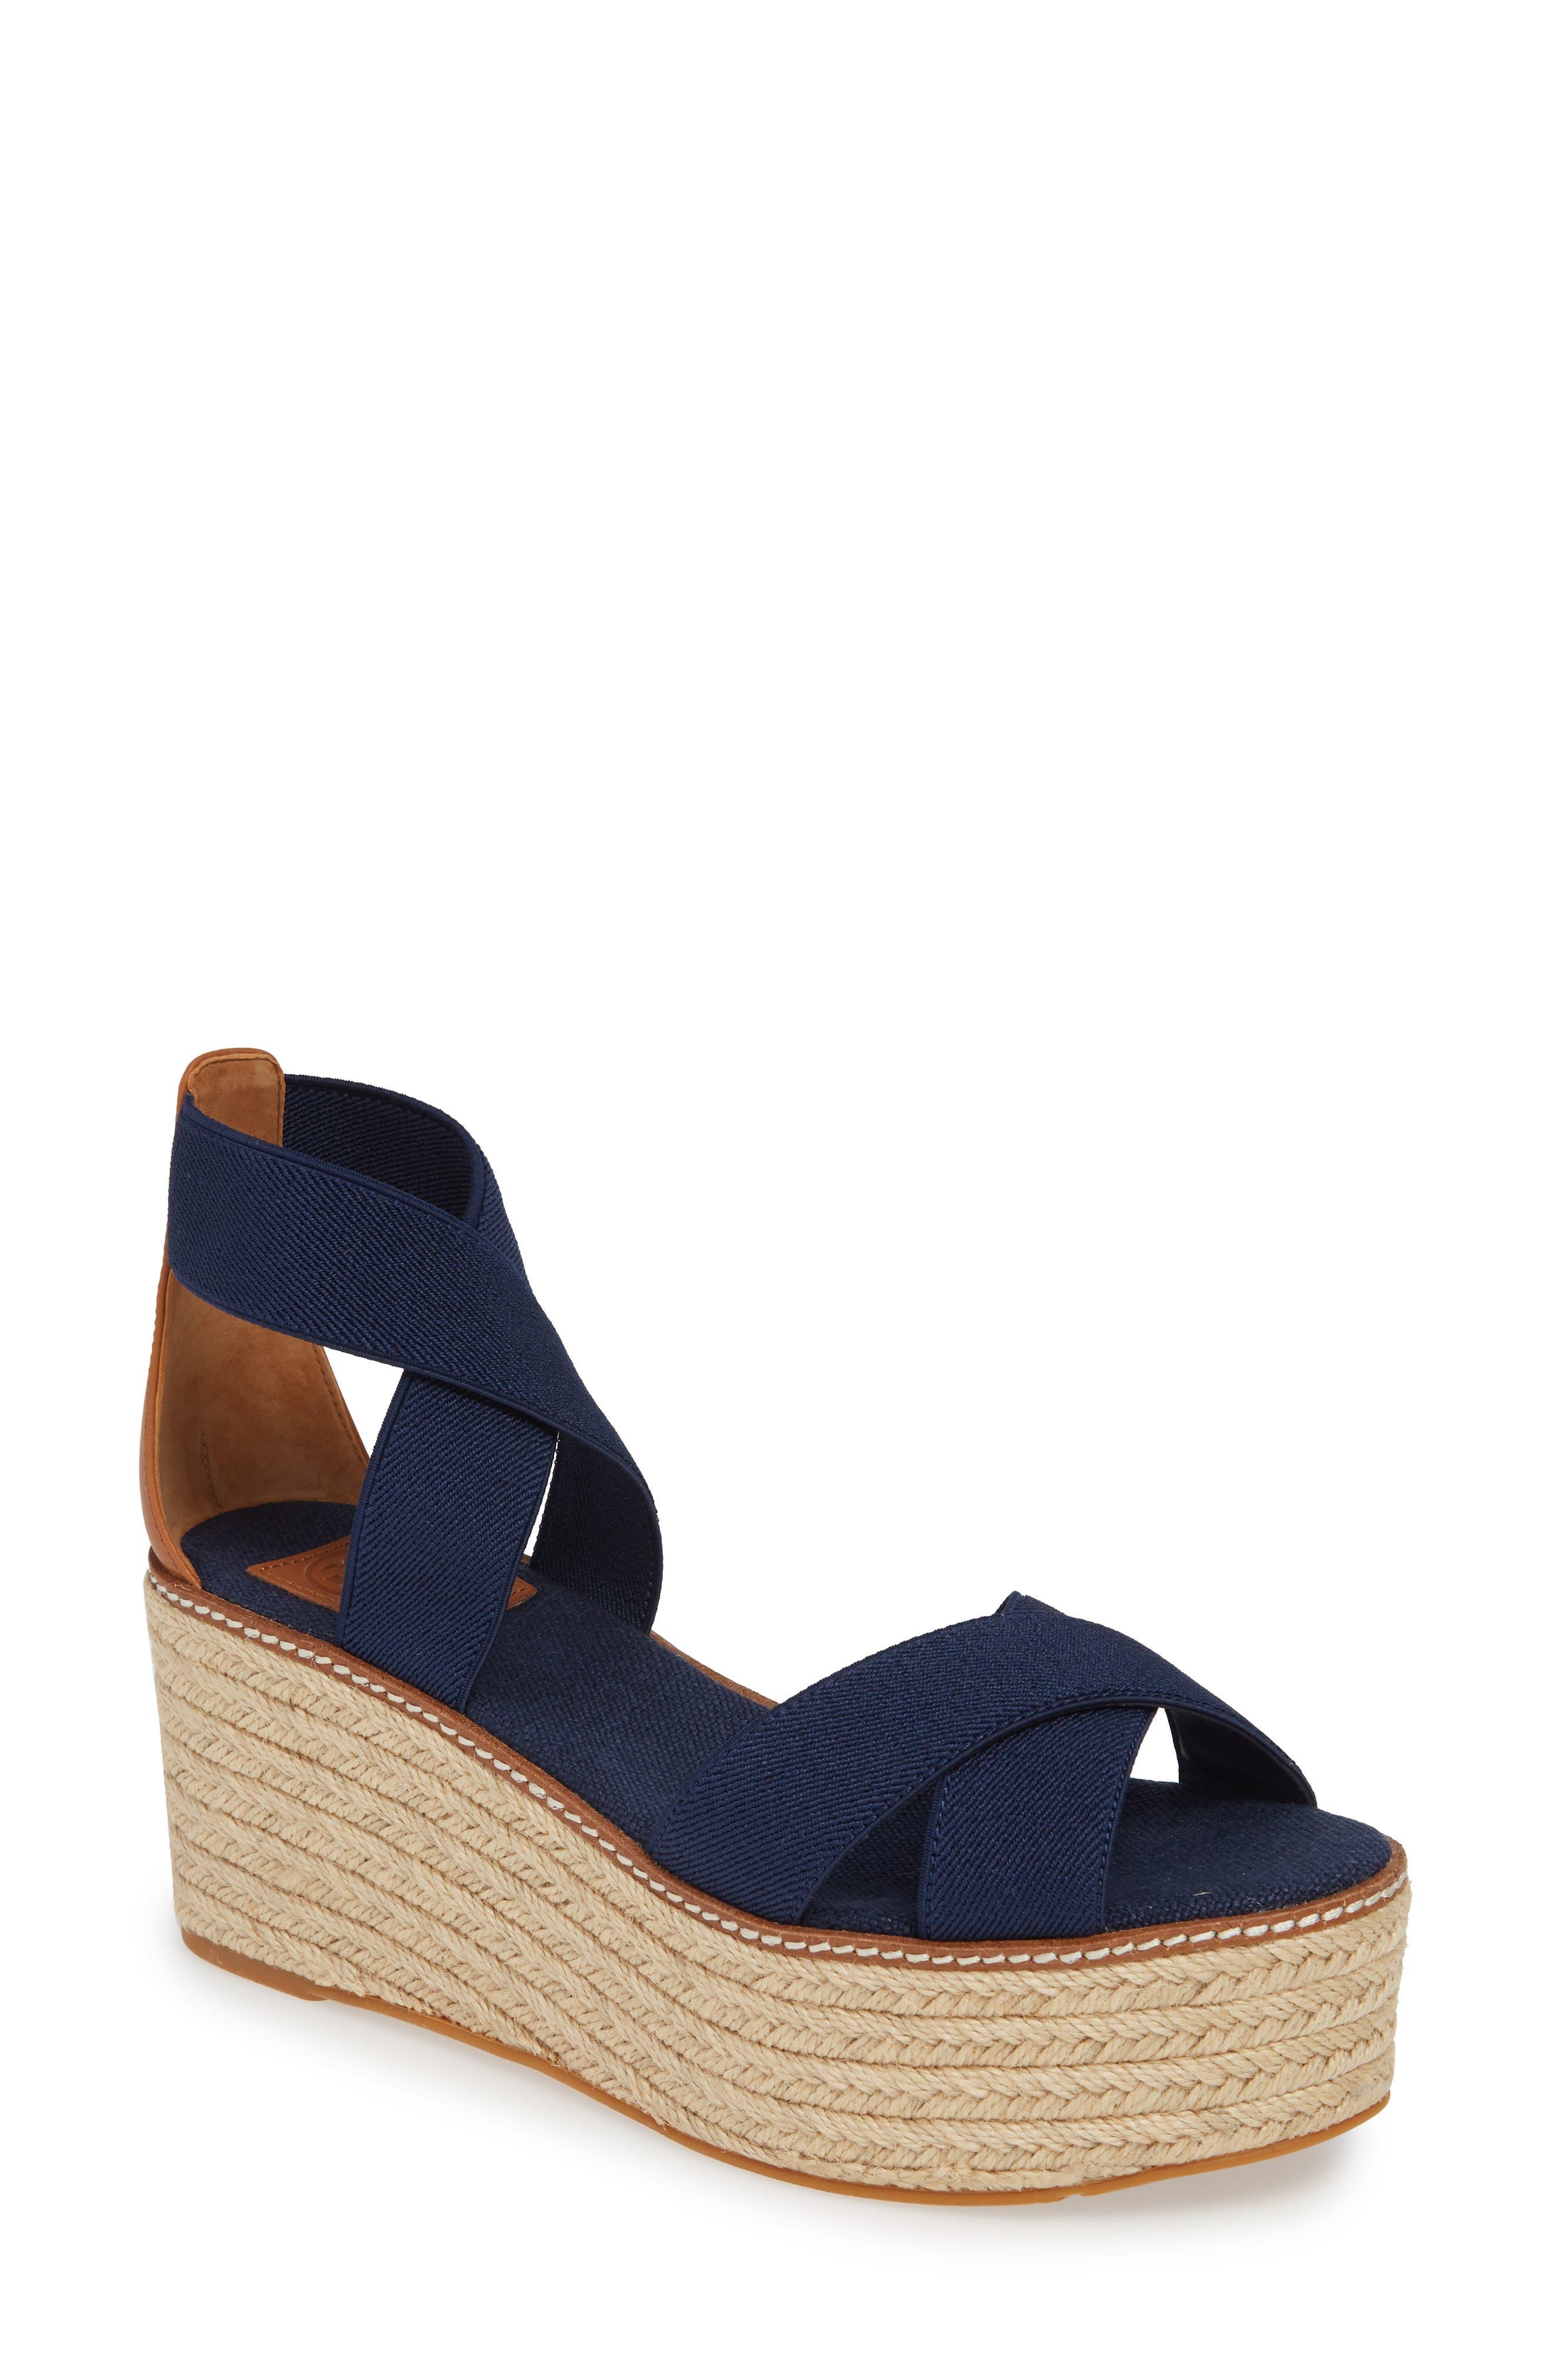 Tory Burch Frieda Espadrille Platform Sandal, Blue